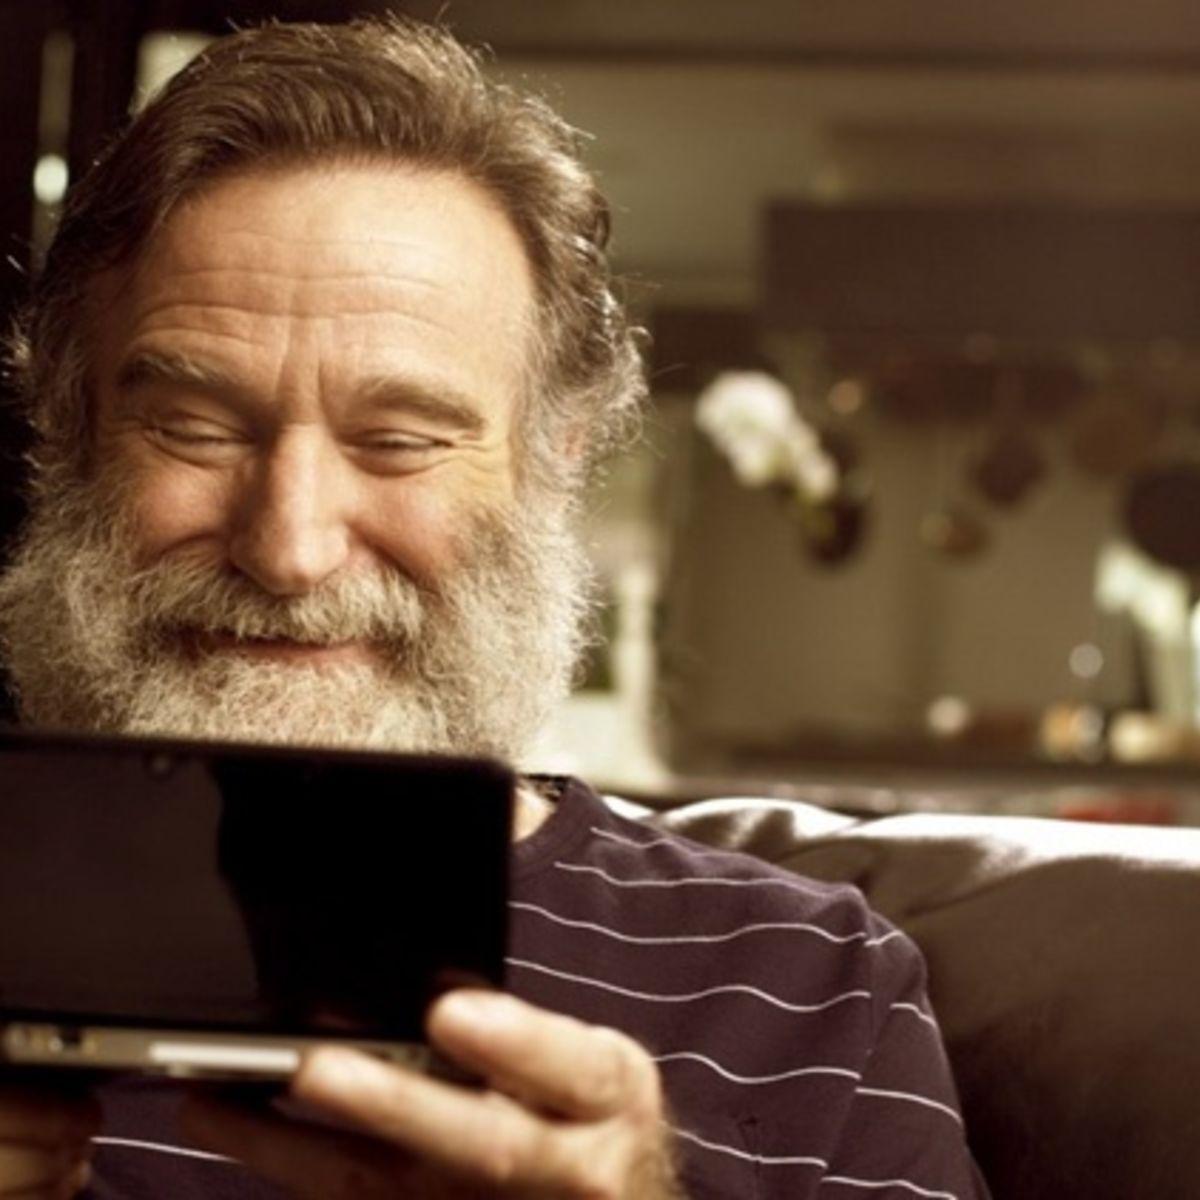 Robin-Williams-gamer-920x422.jpg